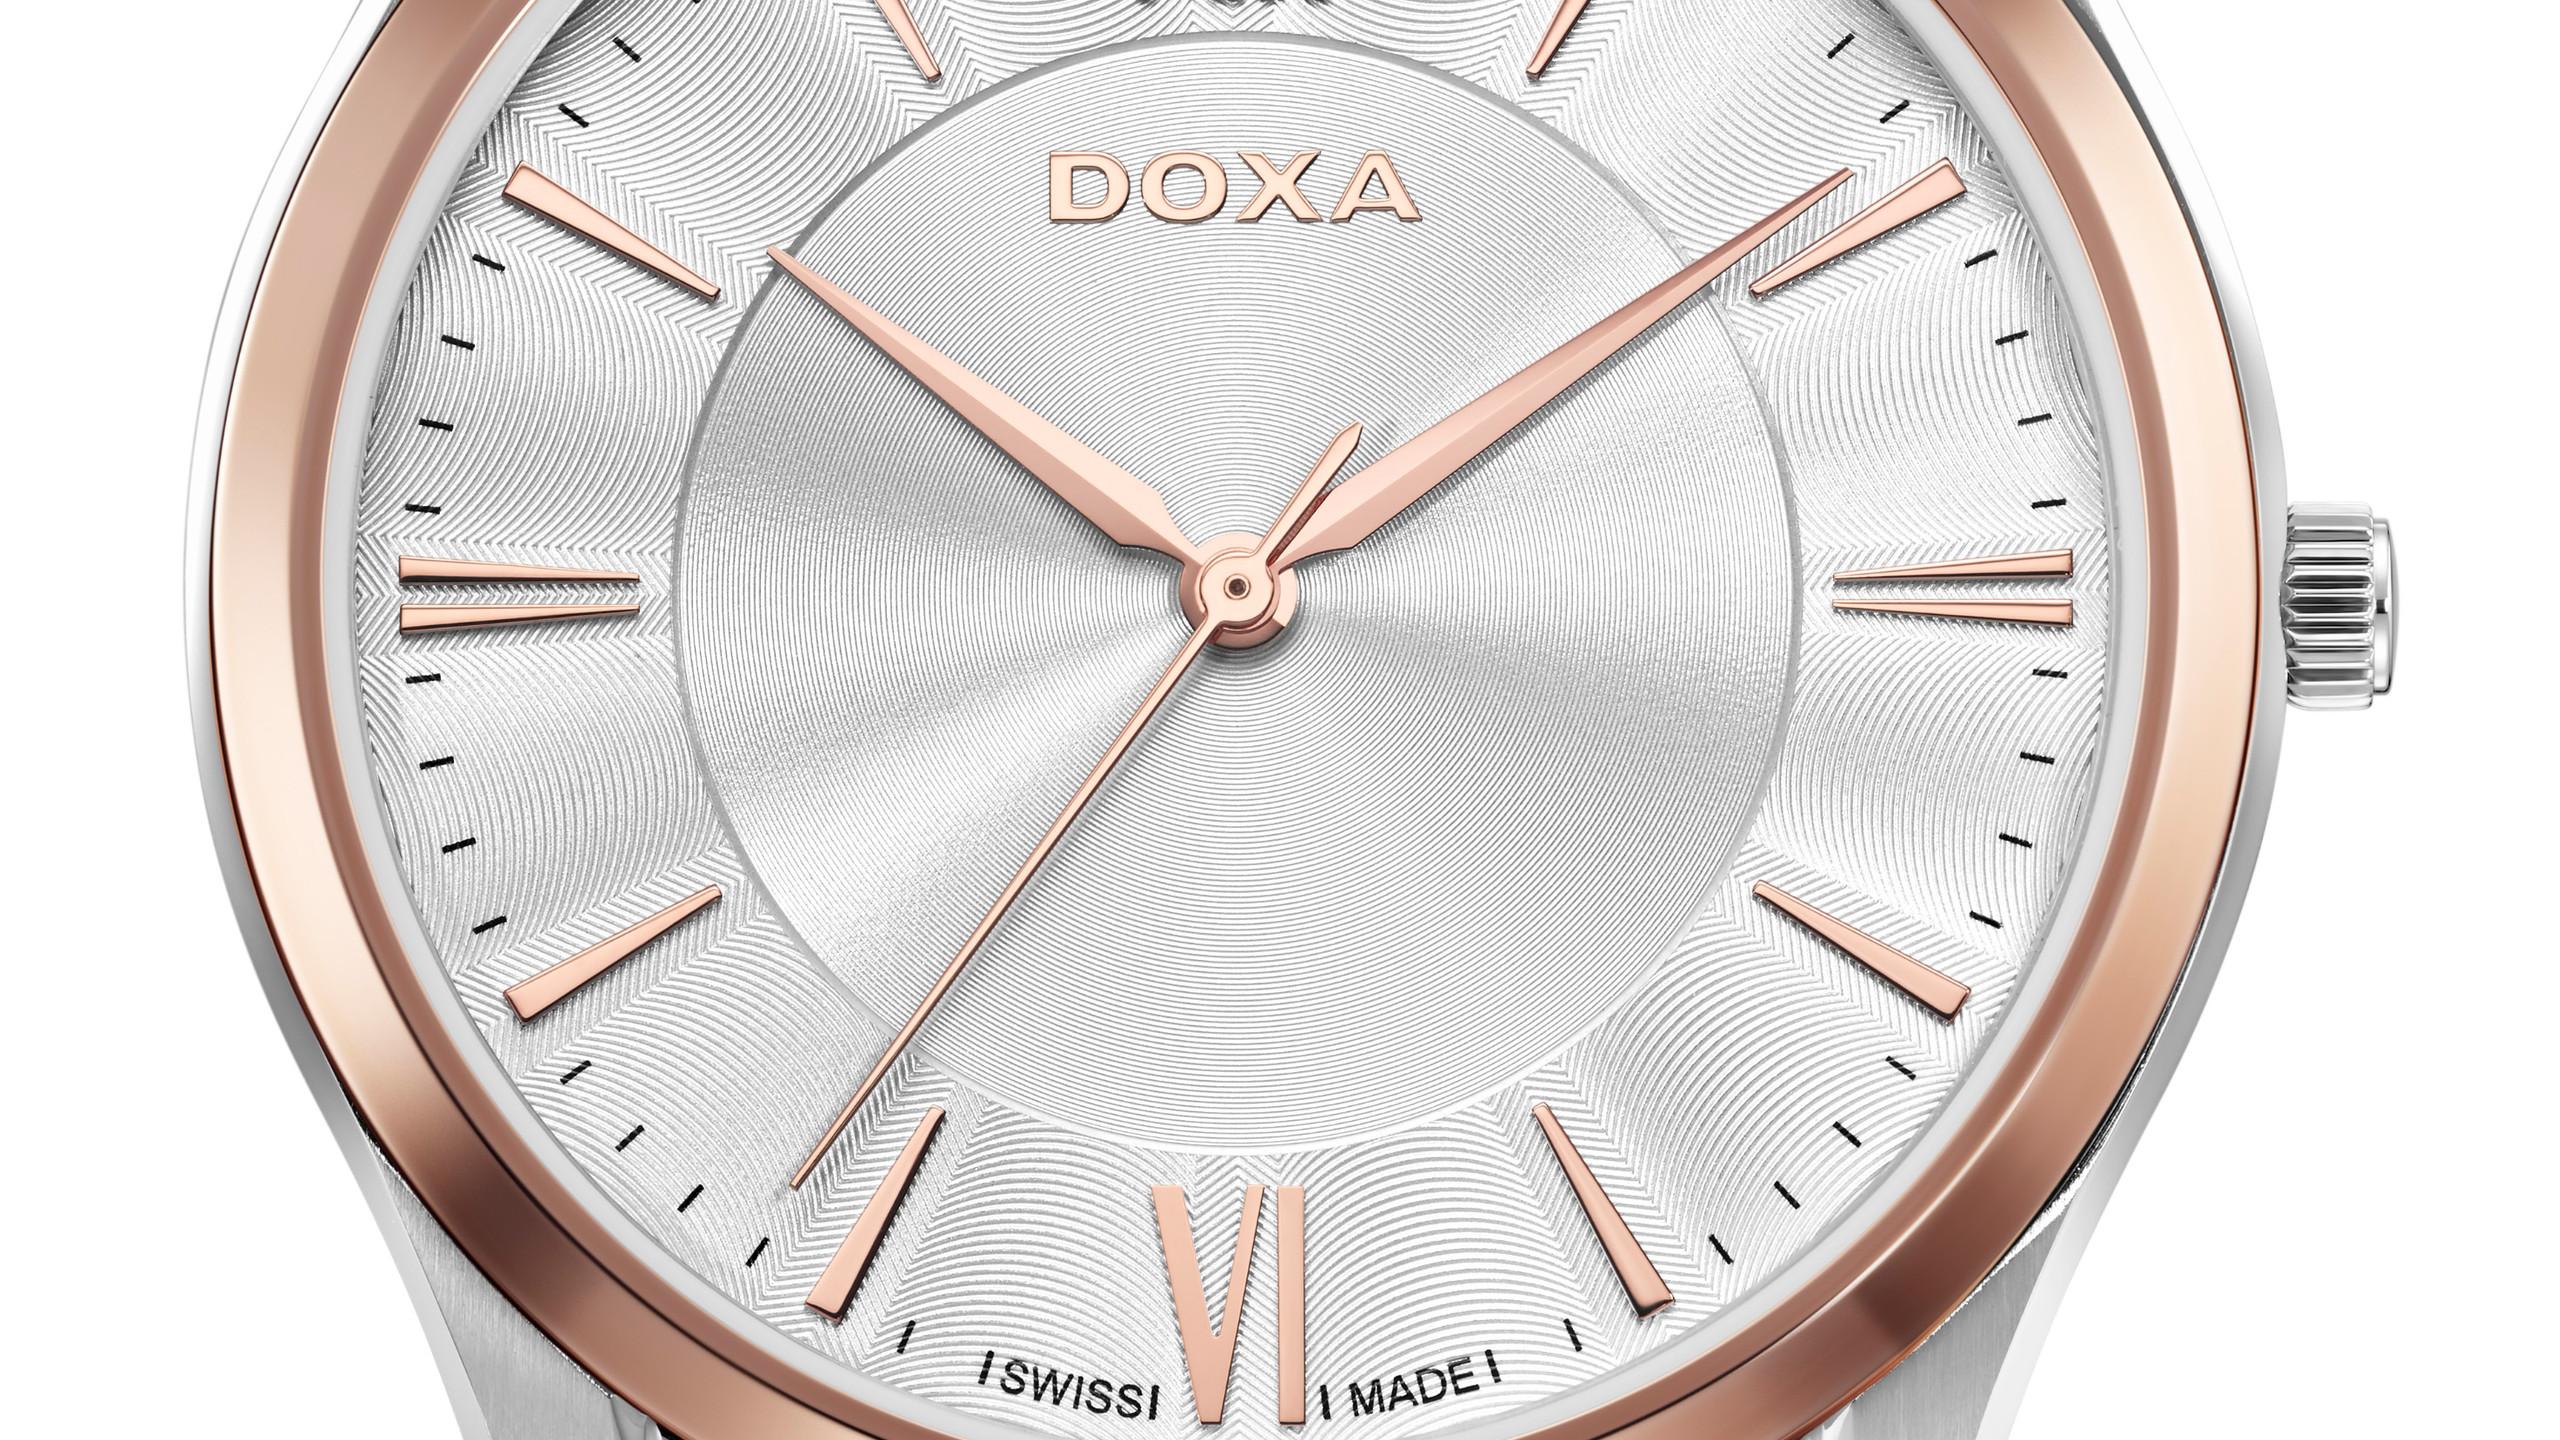 DOXA Executive Slim  直徑40(男裝)30(女裝)毫米精鋼或電鍍玫瑰金錶殼∕時間指示∕瑞士石英機芯∕防水50米/HK$3,680(男裝) HK3,280(女裝)